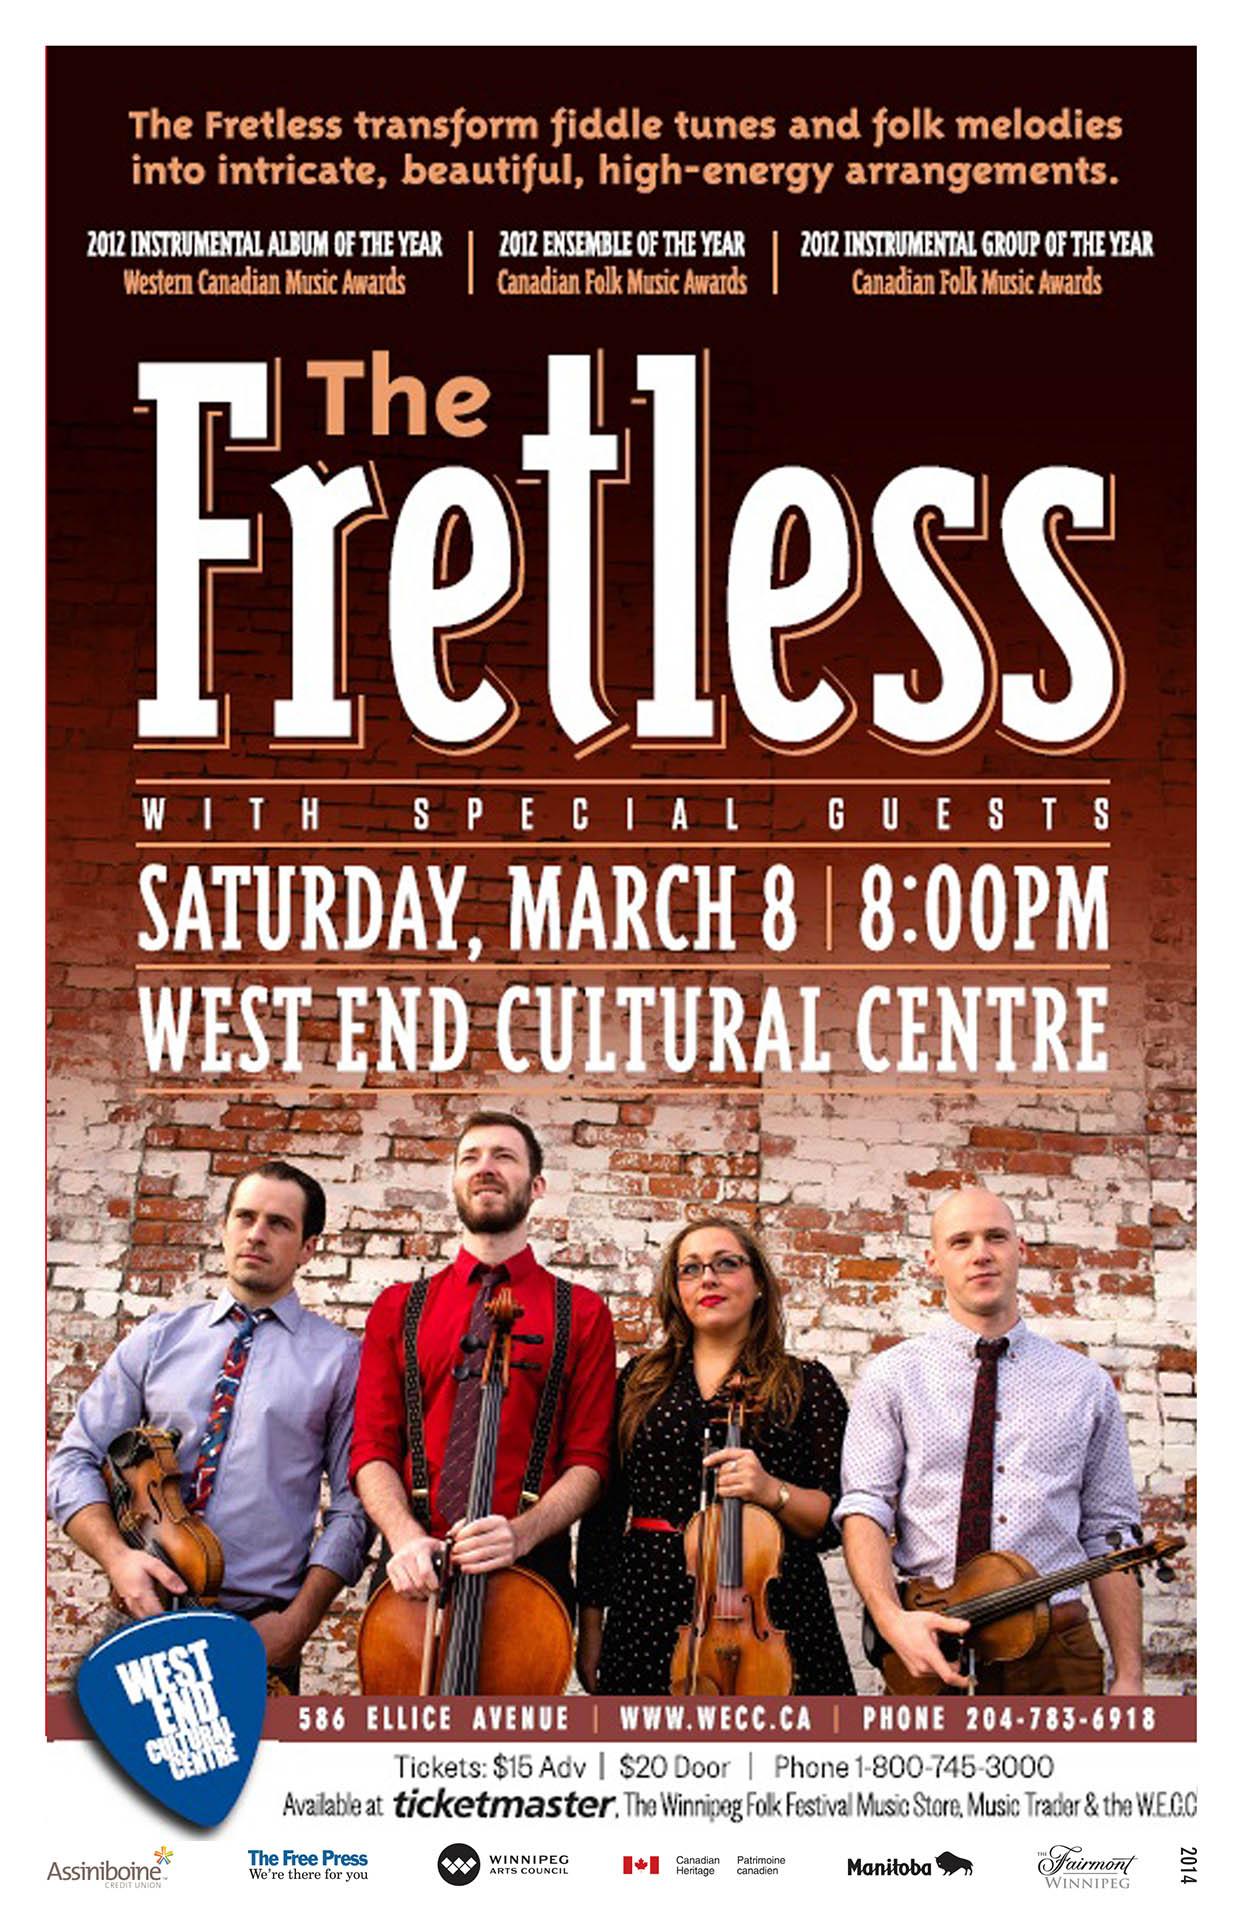 The Fretless - 2014